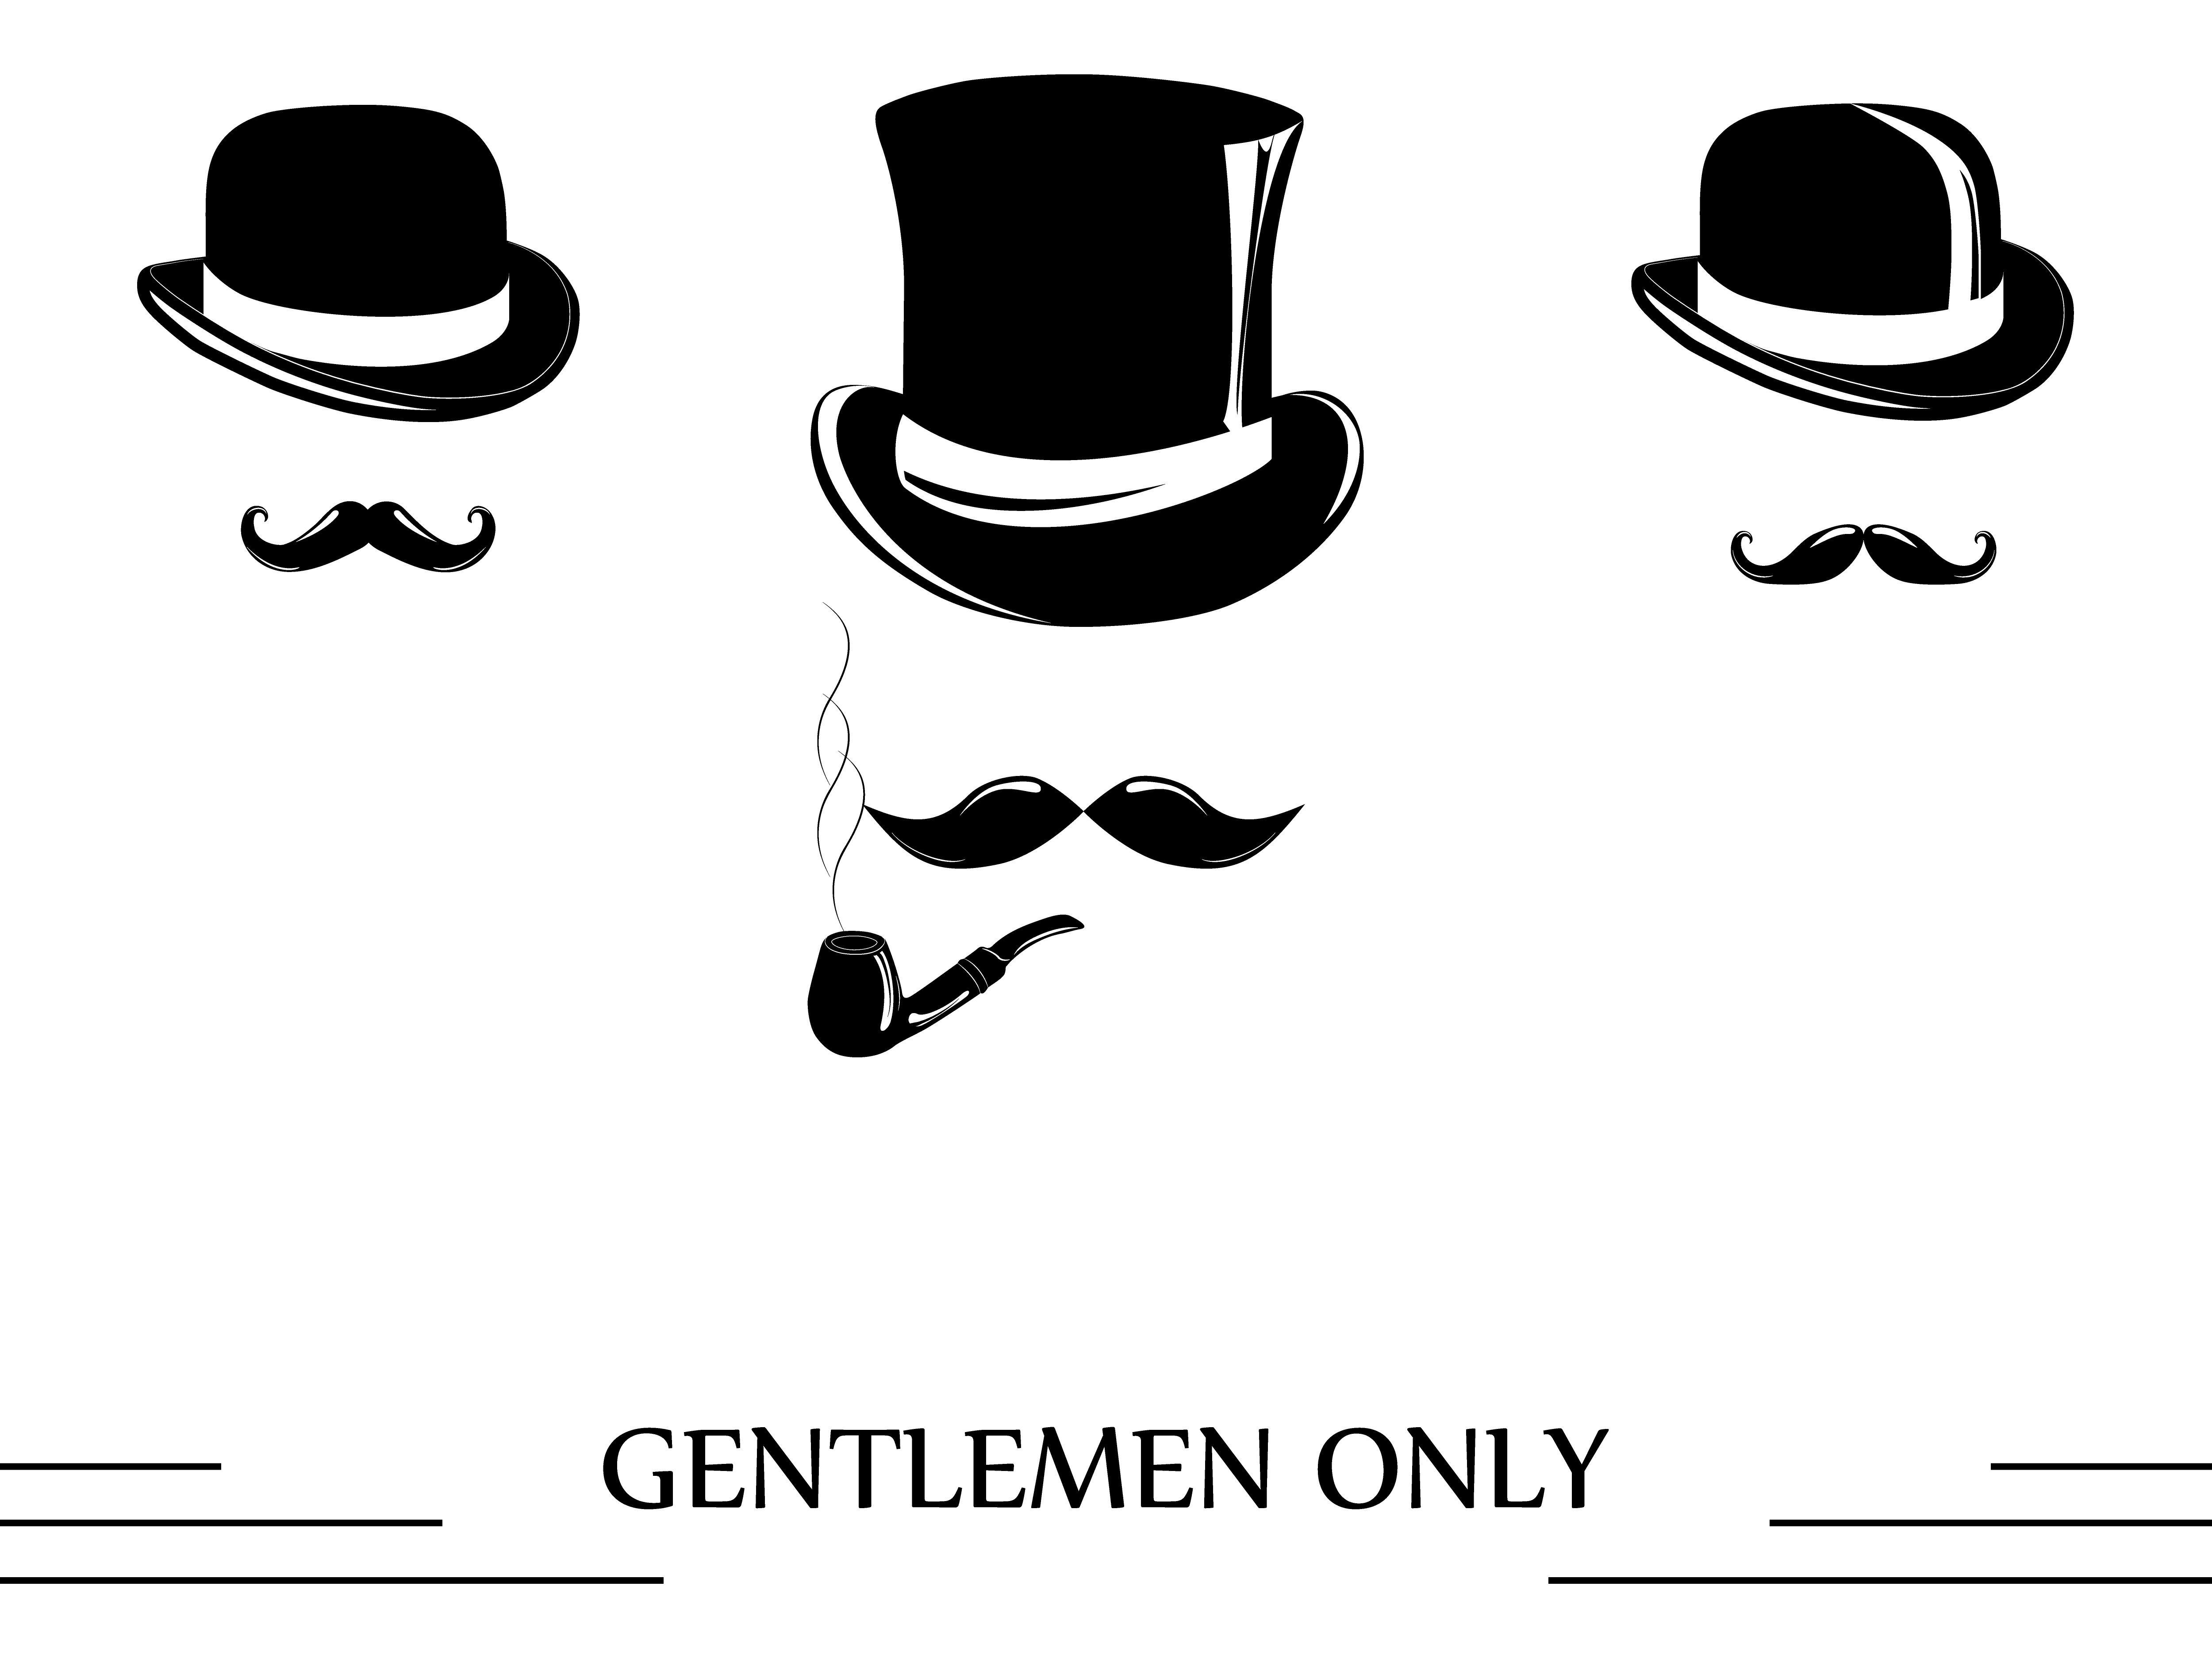 Vintage Gentlemen Elegance Logo Gentleman Gentlemen Hat Bowler Derby Top Hat Cylinder Headdress Headgear Gentleman Vintage Gentleman Moustache Style